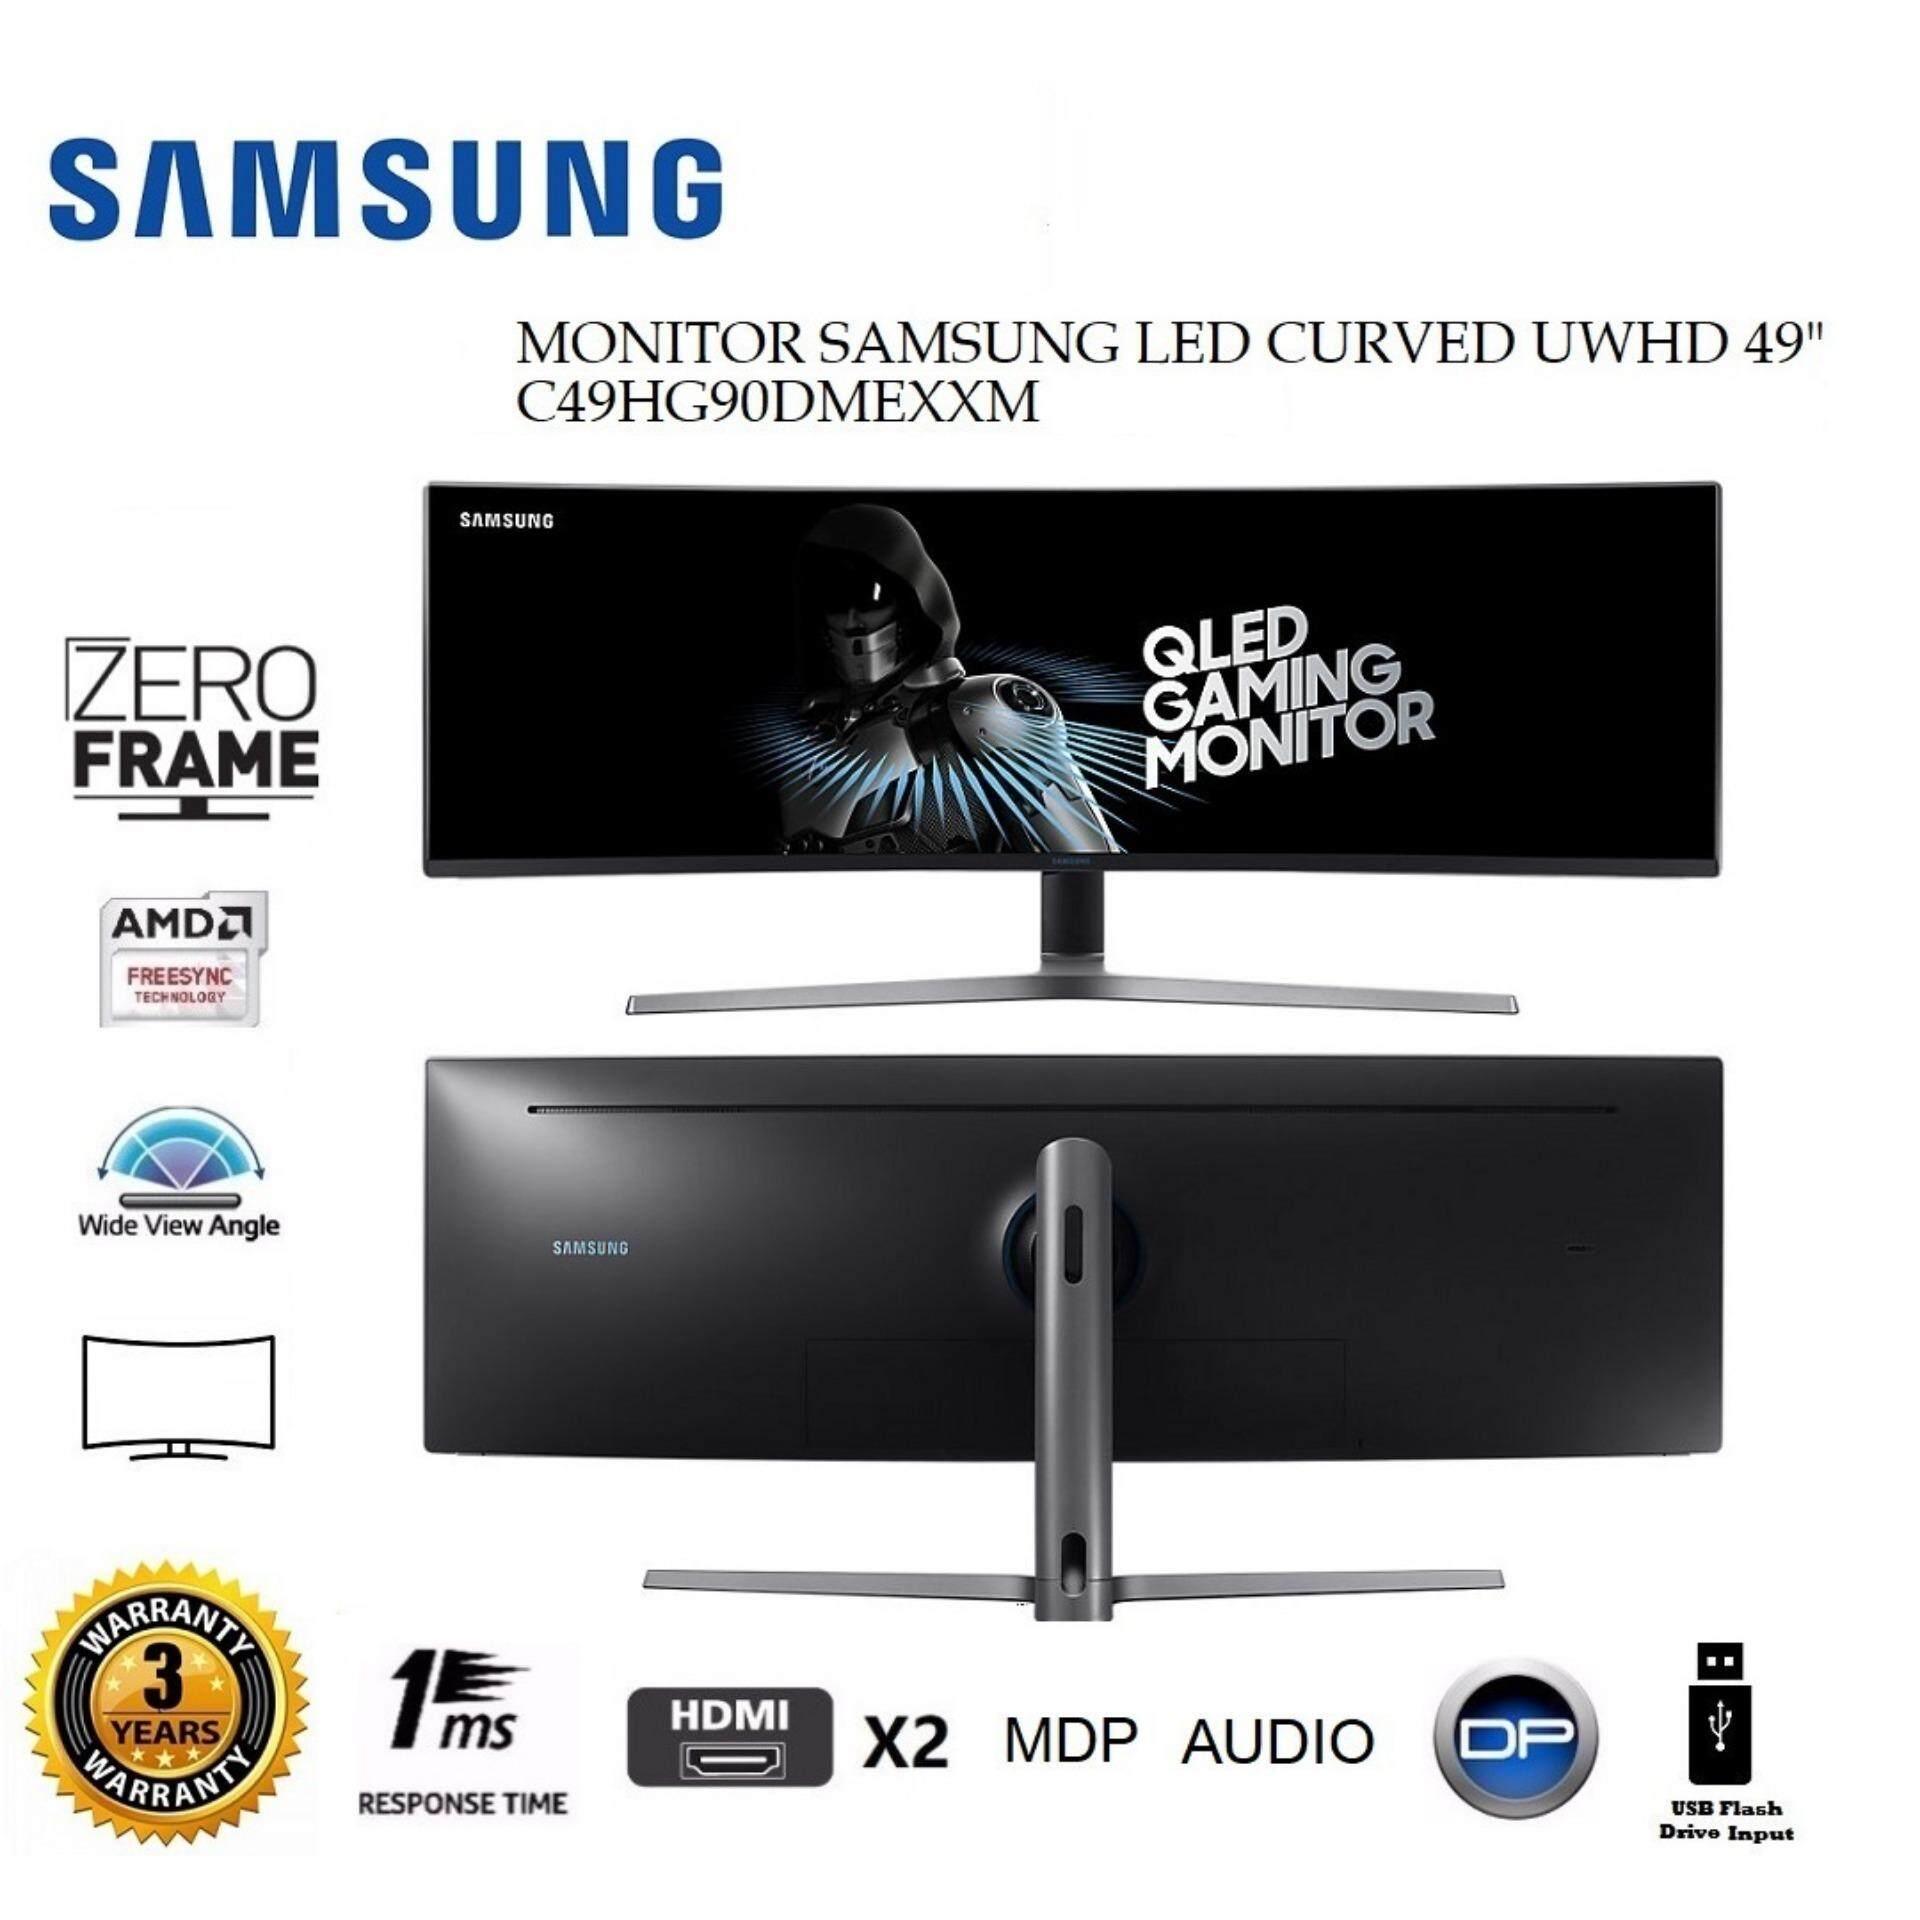 GENUINE SAMSUNG LED CURVED UWHD 49  C49HG90DMEXXM LCD MONITOR (1MS/HDMI*2/DP/MDP/USB/AUDIO) BLACK Malaysia